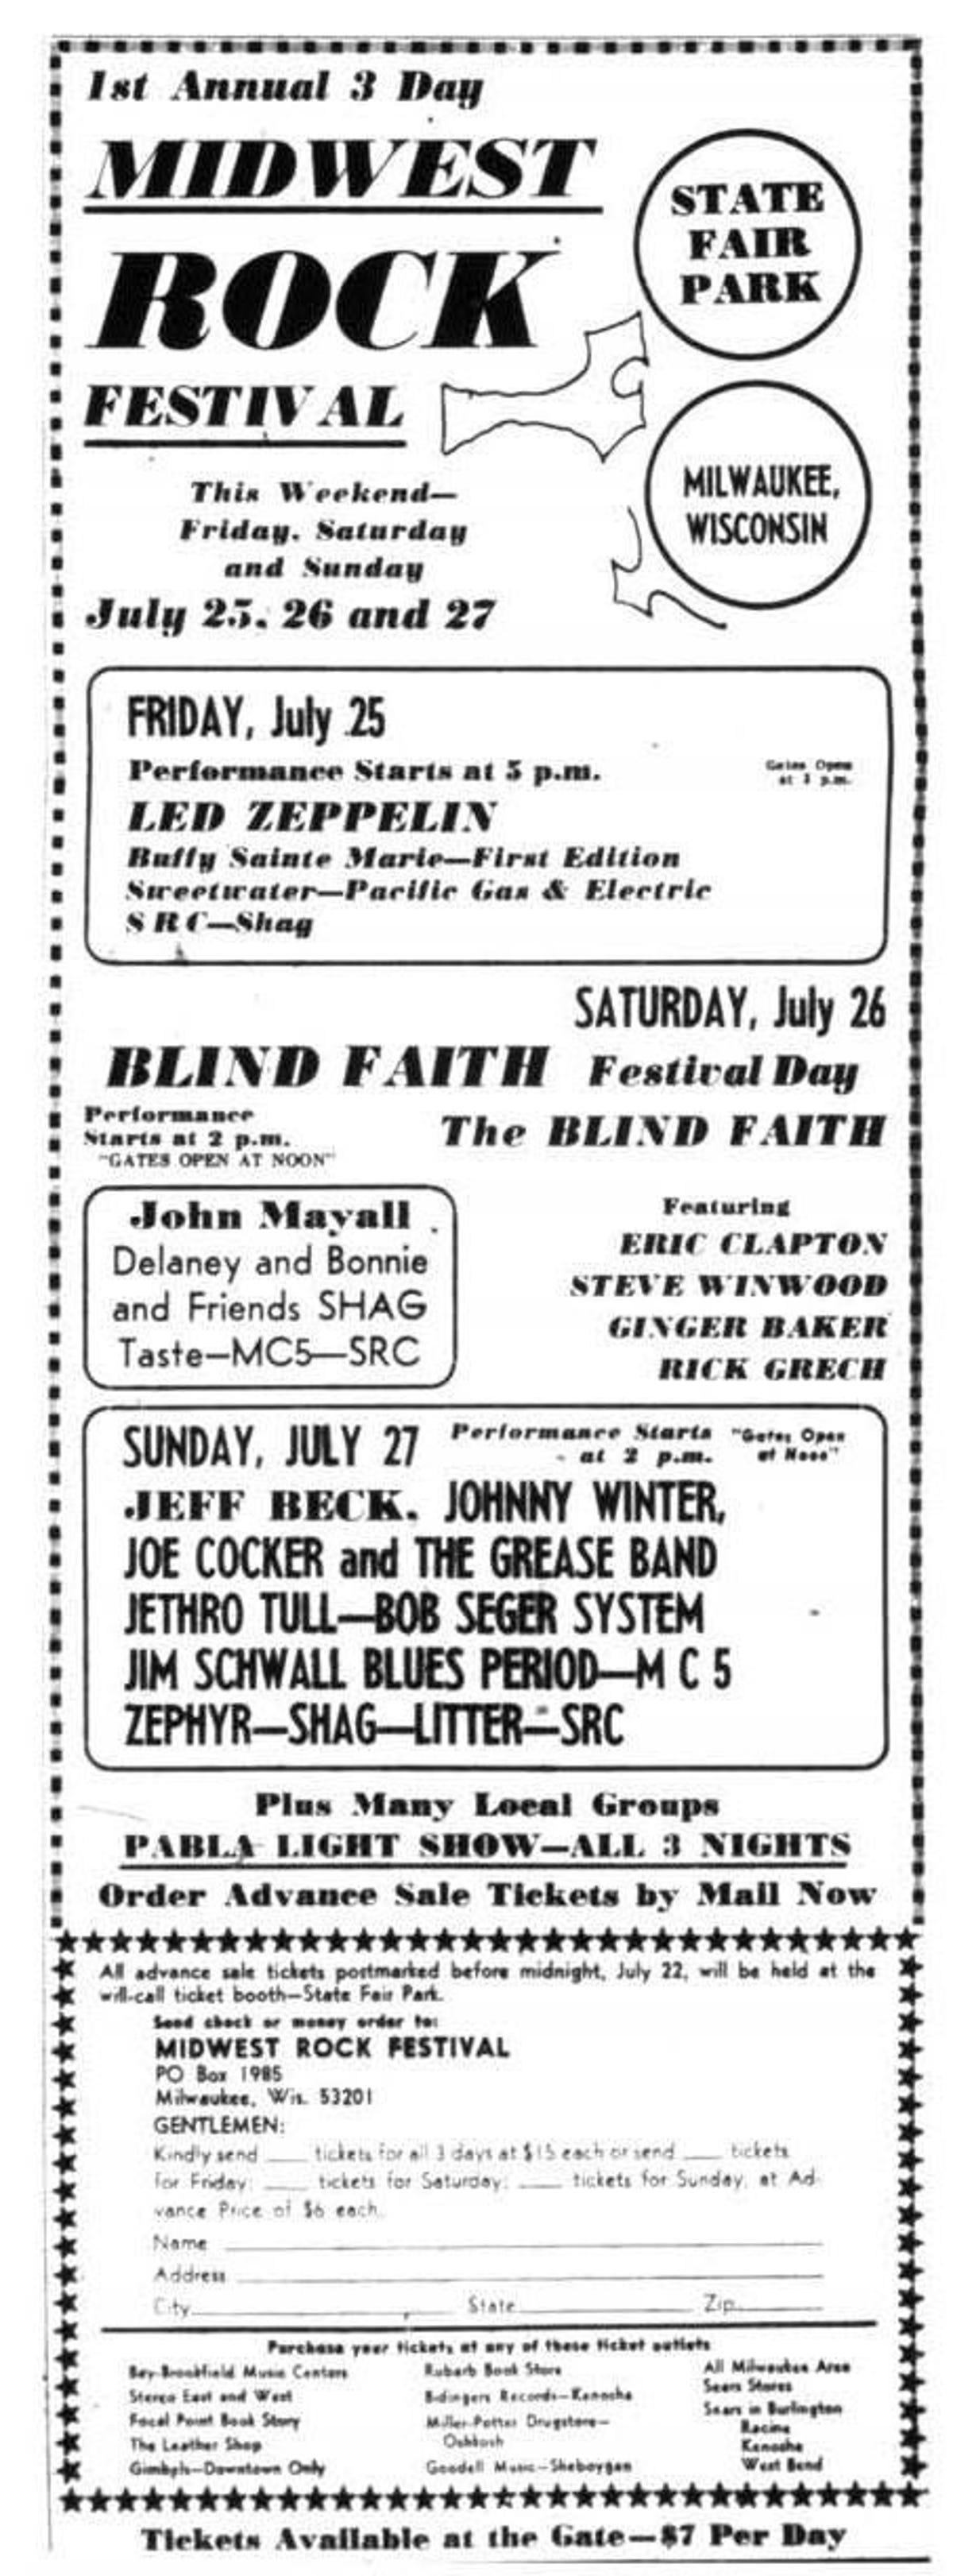 In 1969, Milwaukee had its own big rock festival, three